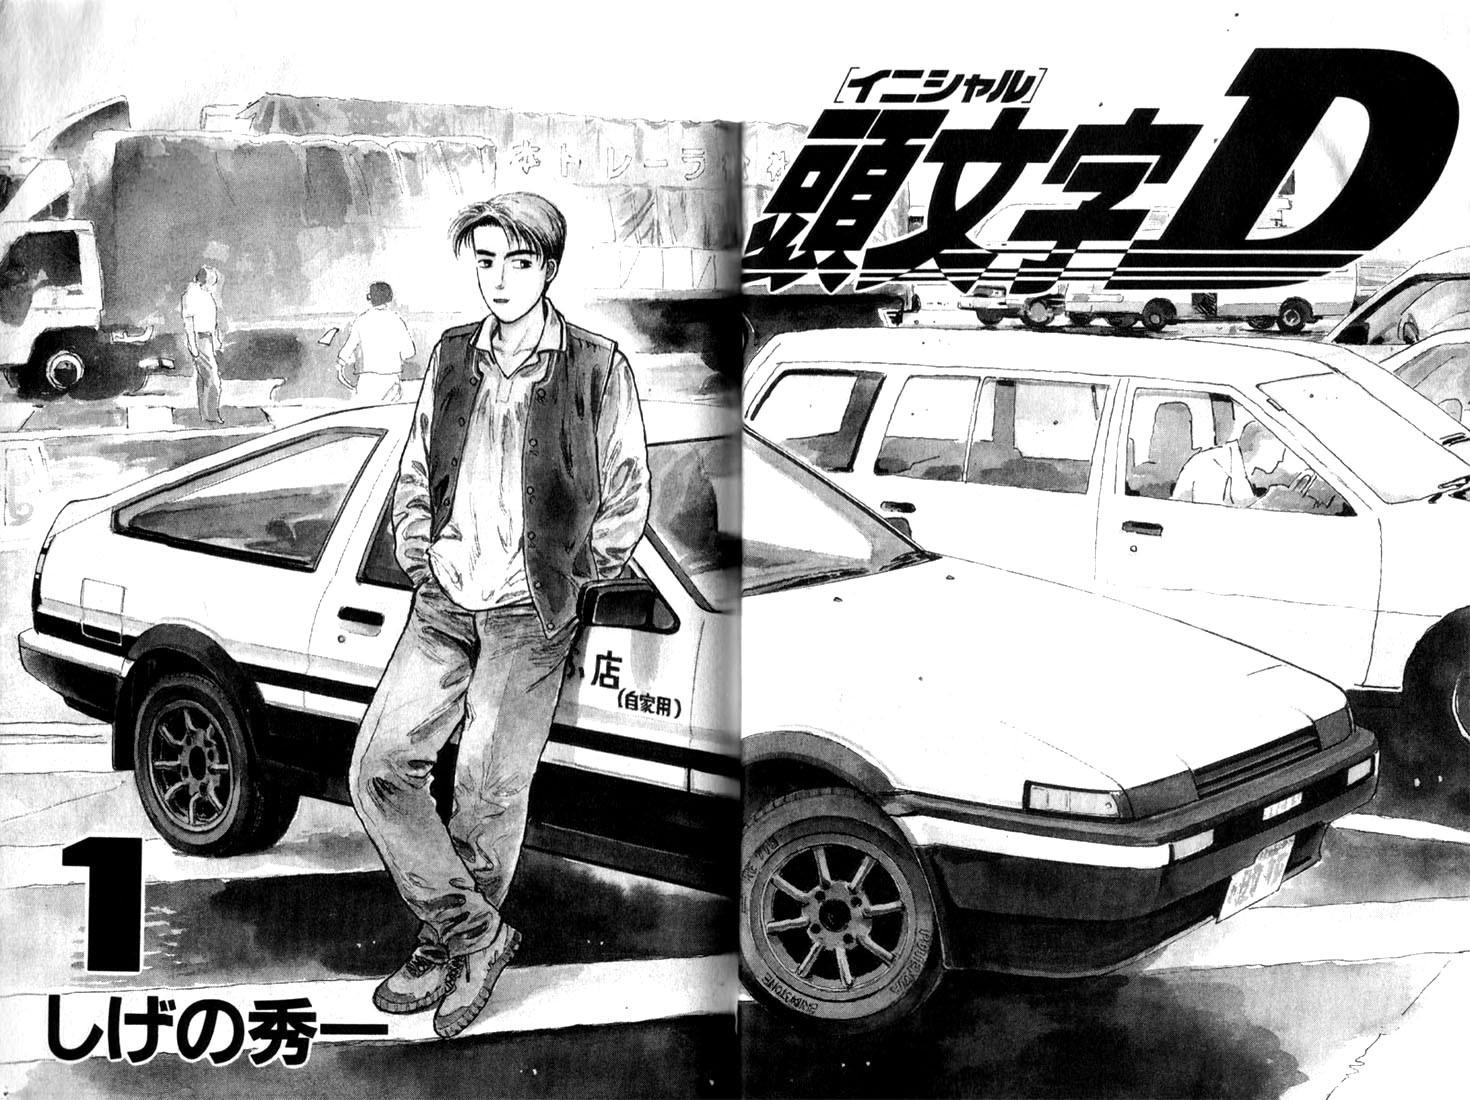 Anime 1470x1100 Initial D Toyota Sprinter Trueno AE86 GT-Apex car anime boys anime vehicle monochrome pop-up headlights Takumi Fujiwara